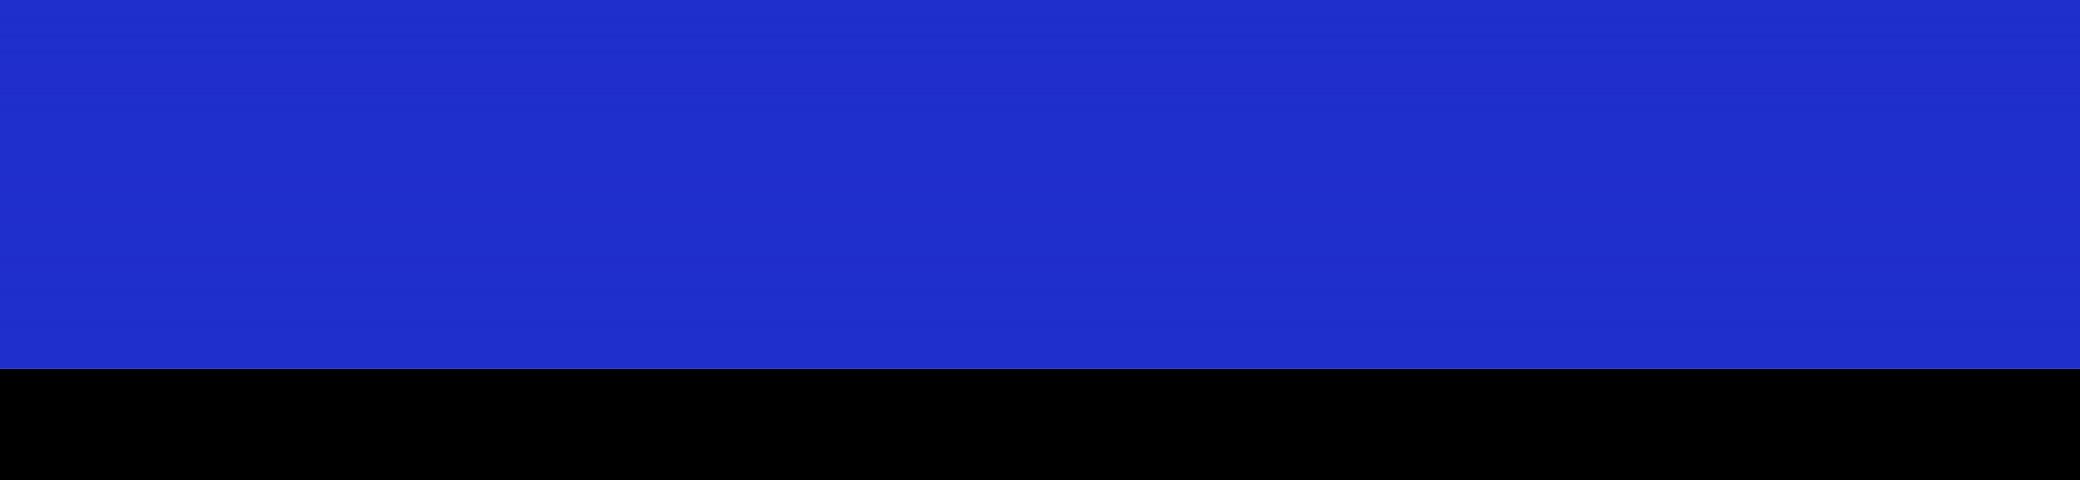 Blu-overlay-01.png